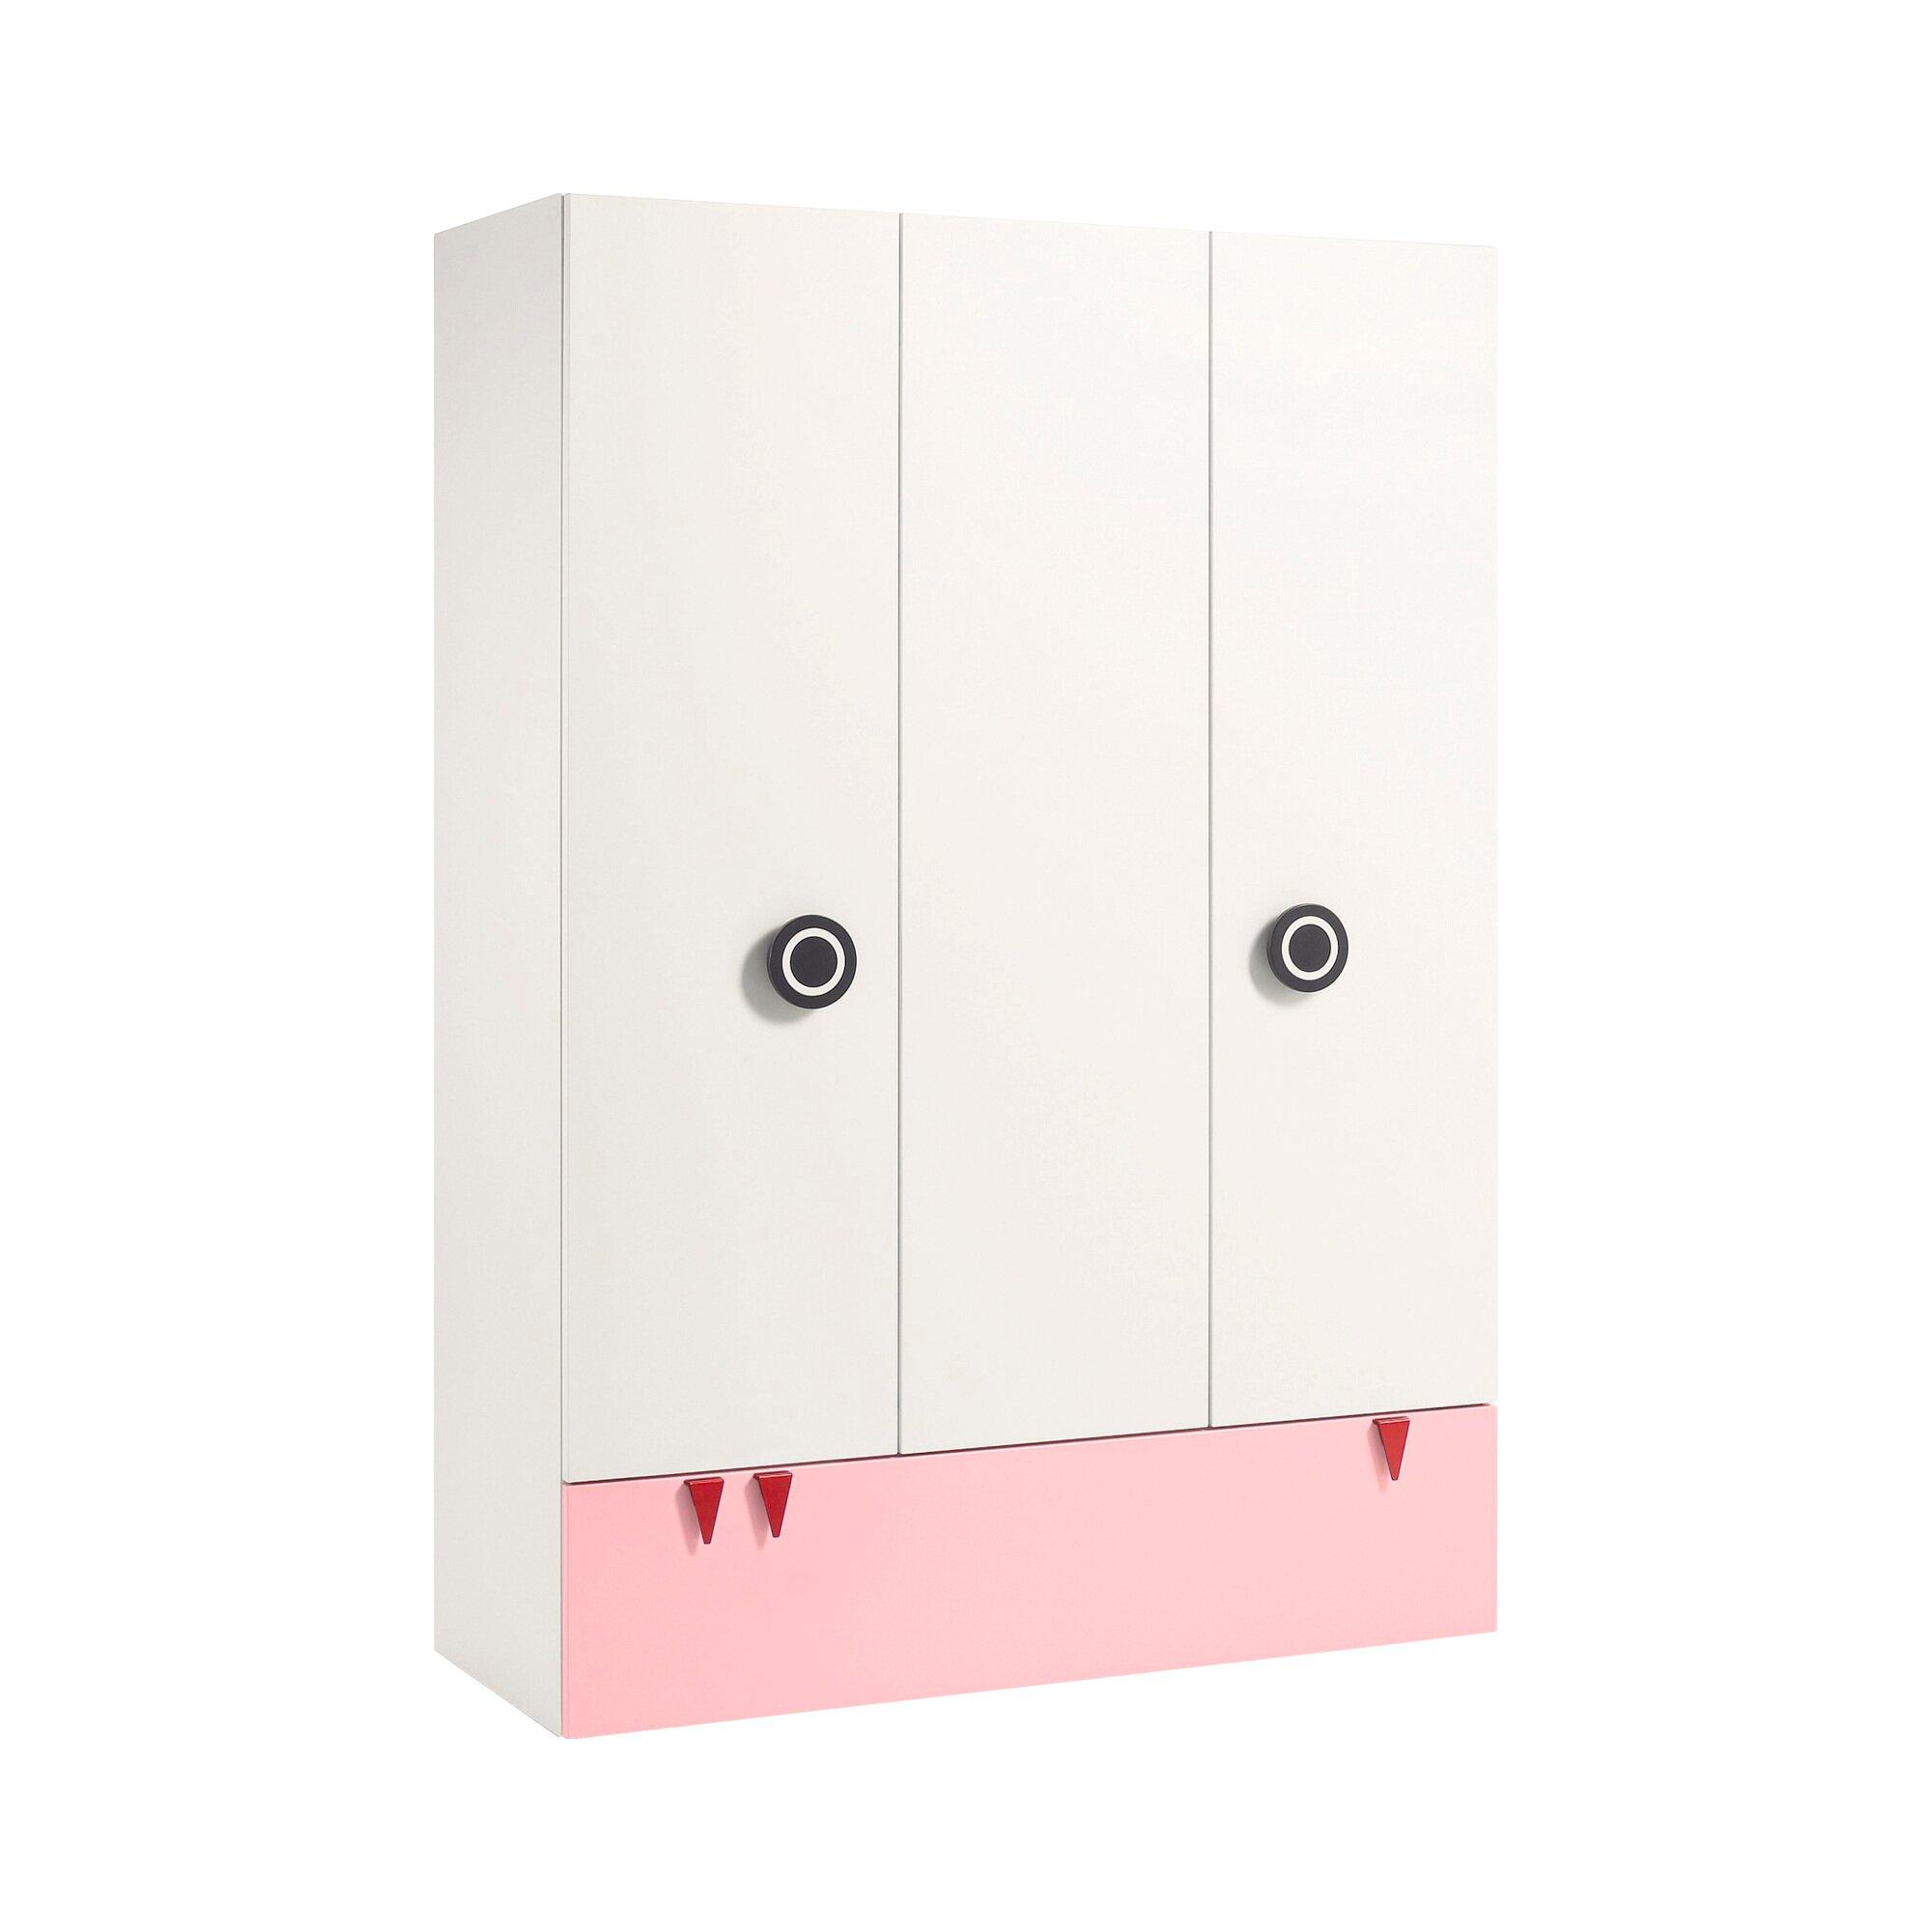 Now! Minimo Kleiderschrank MINIMO (3 Türen, 1 Schublade)